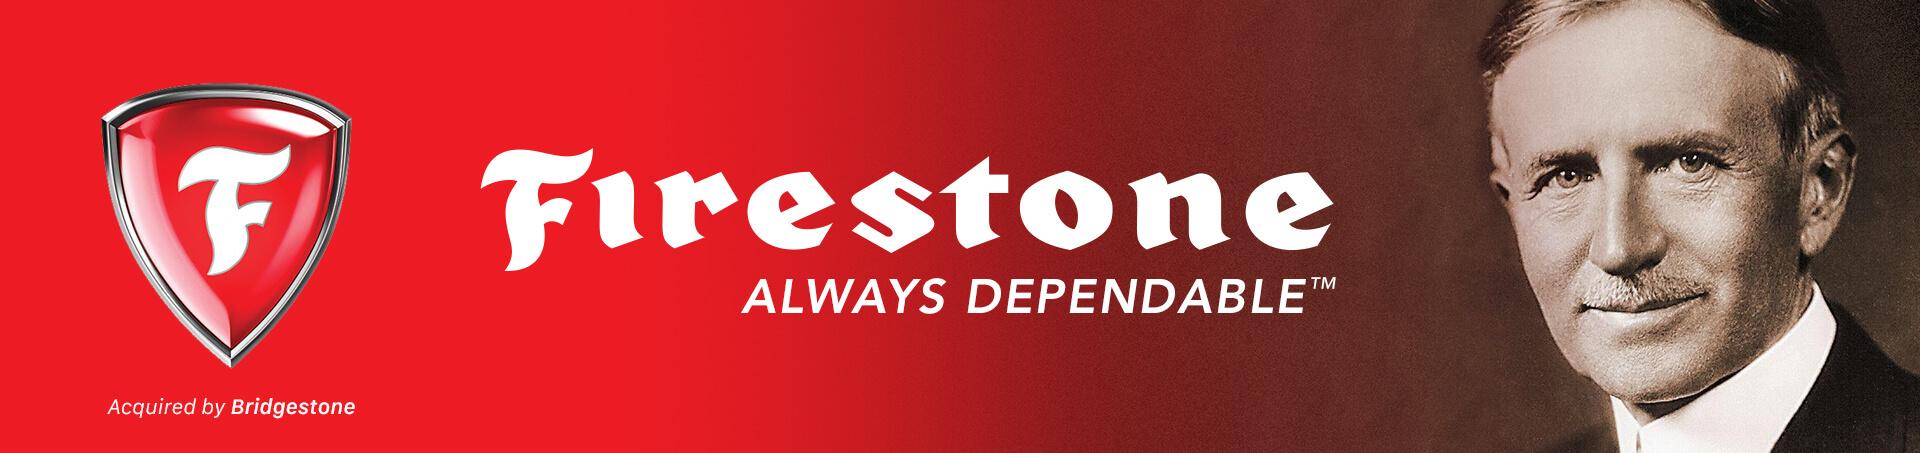 Firestone always dependable